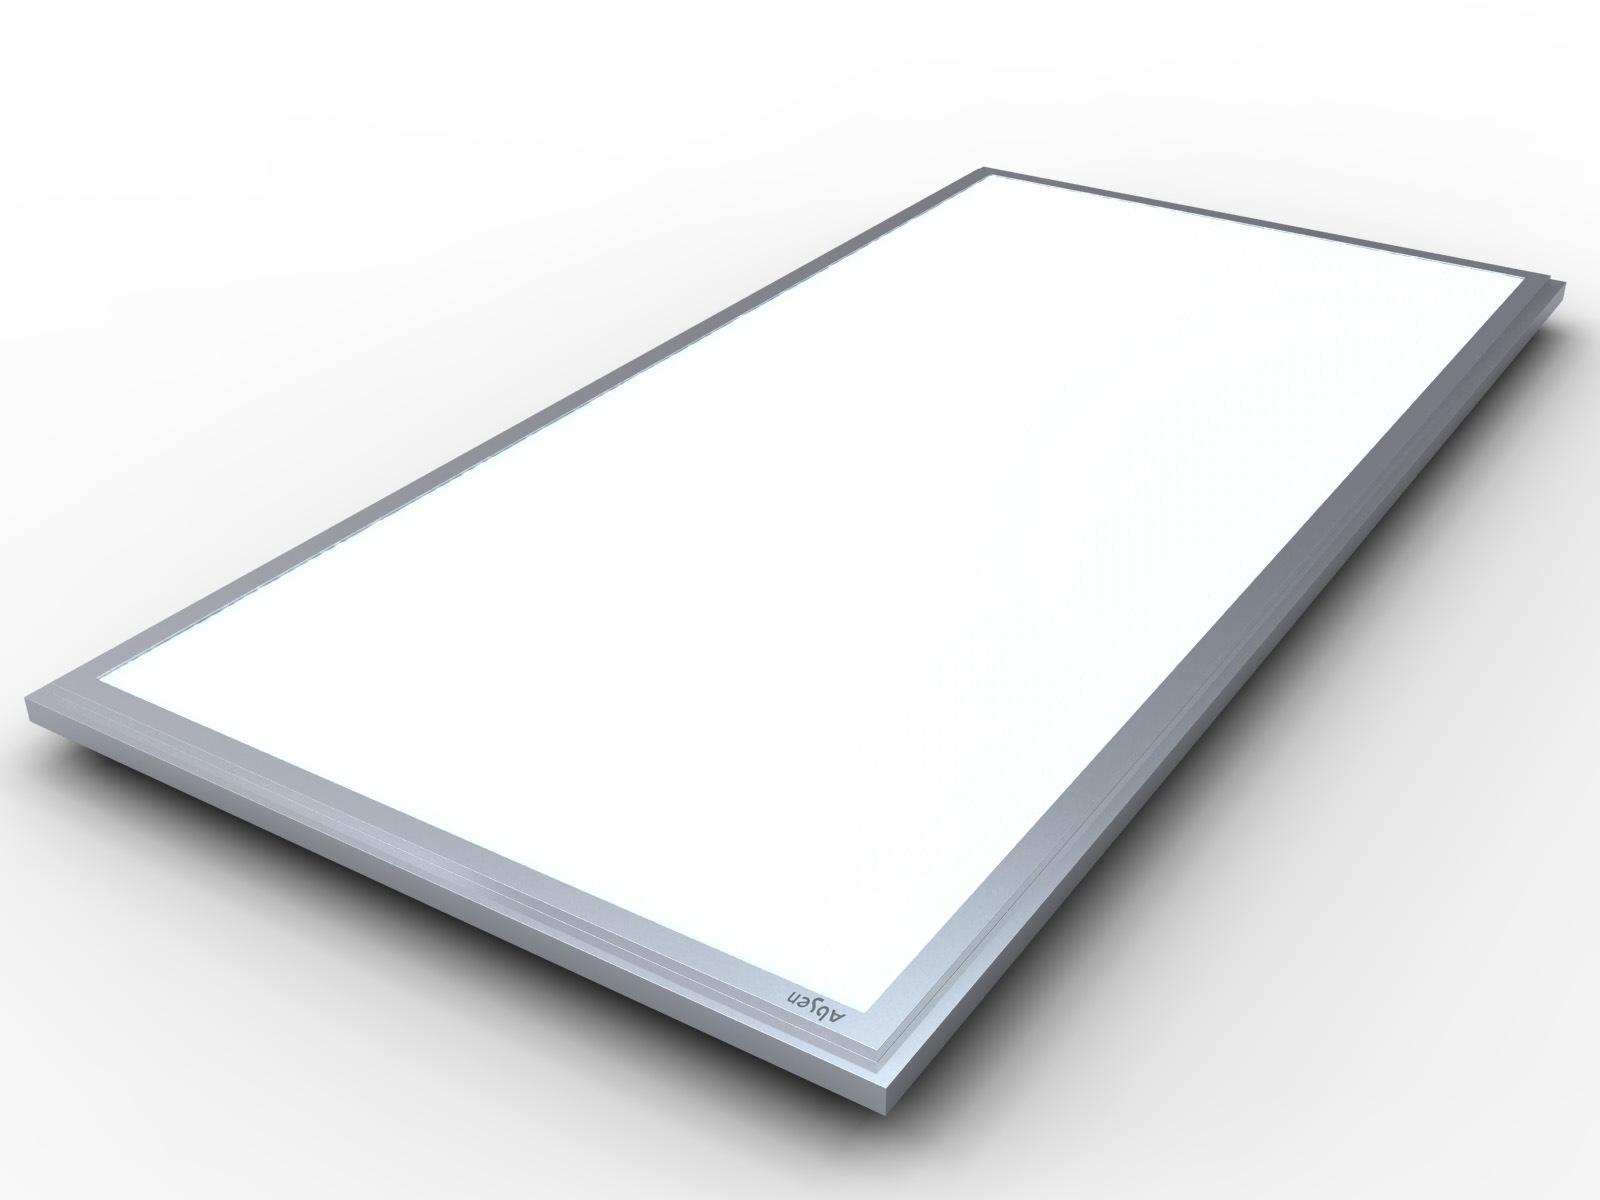 china led panel light 1200mm ah02 china led panel light smd led panel light. Black Bedroom Furniture Sets. Home Design Ideas